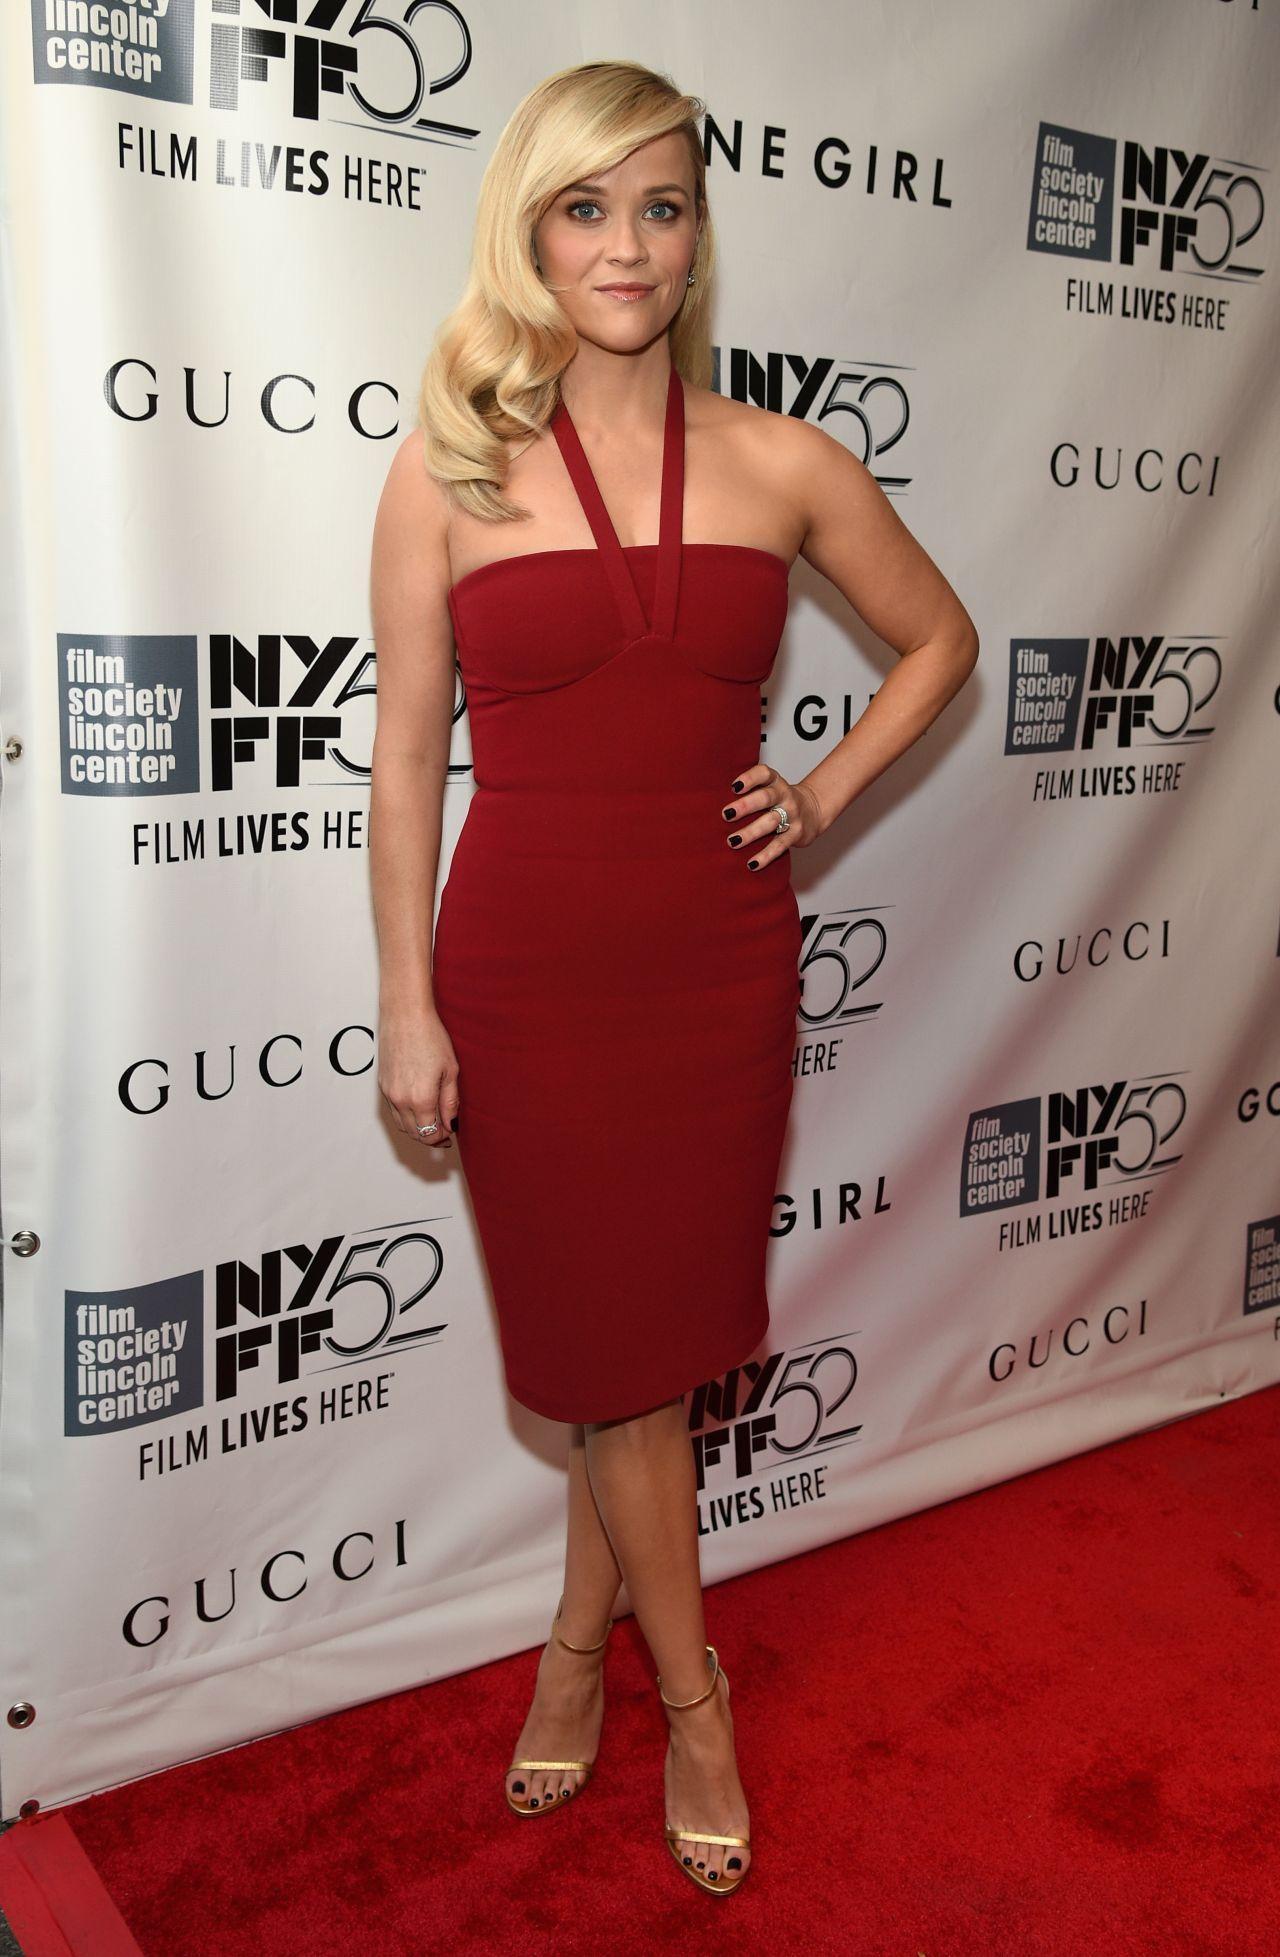 Reese Witherspoon - MOOICHEAP.COM  -  Síguenos también en FACEBOOK en  https://www.facebook.com/pages/mooicheapcom/262164390606235?ref=hl Y en TWITTER https://twitter.com/mooicheap